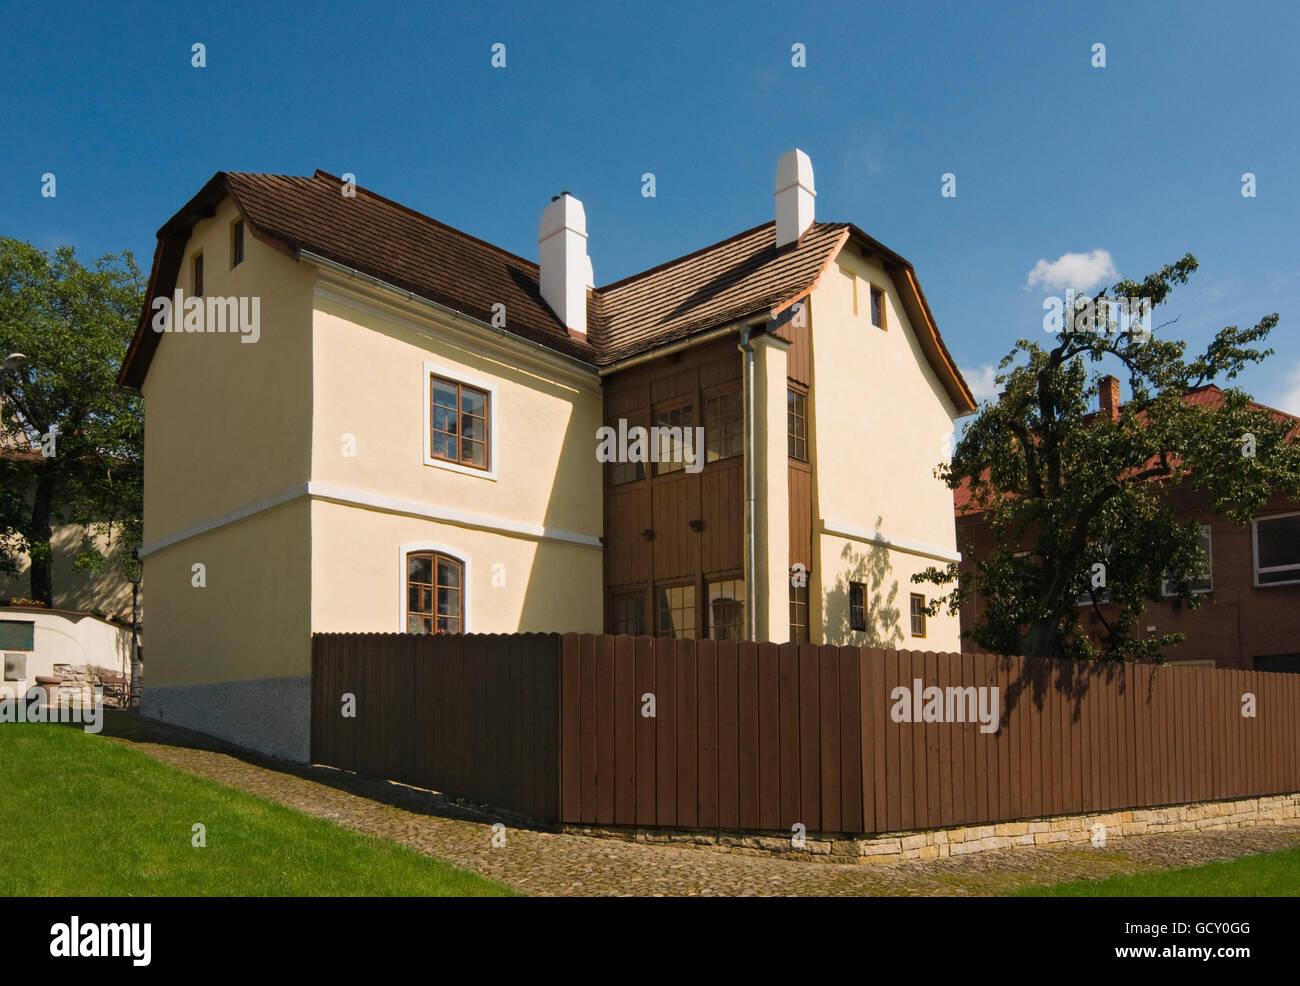 Birthplace of Dr. Sigmund Freud, Zamecnicka ulice, Schlossergasse, Pribor, Freiberg, Moravian-Silesian Region, Czech - Stock Image